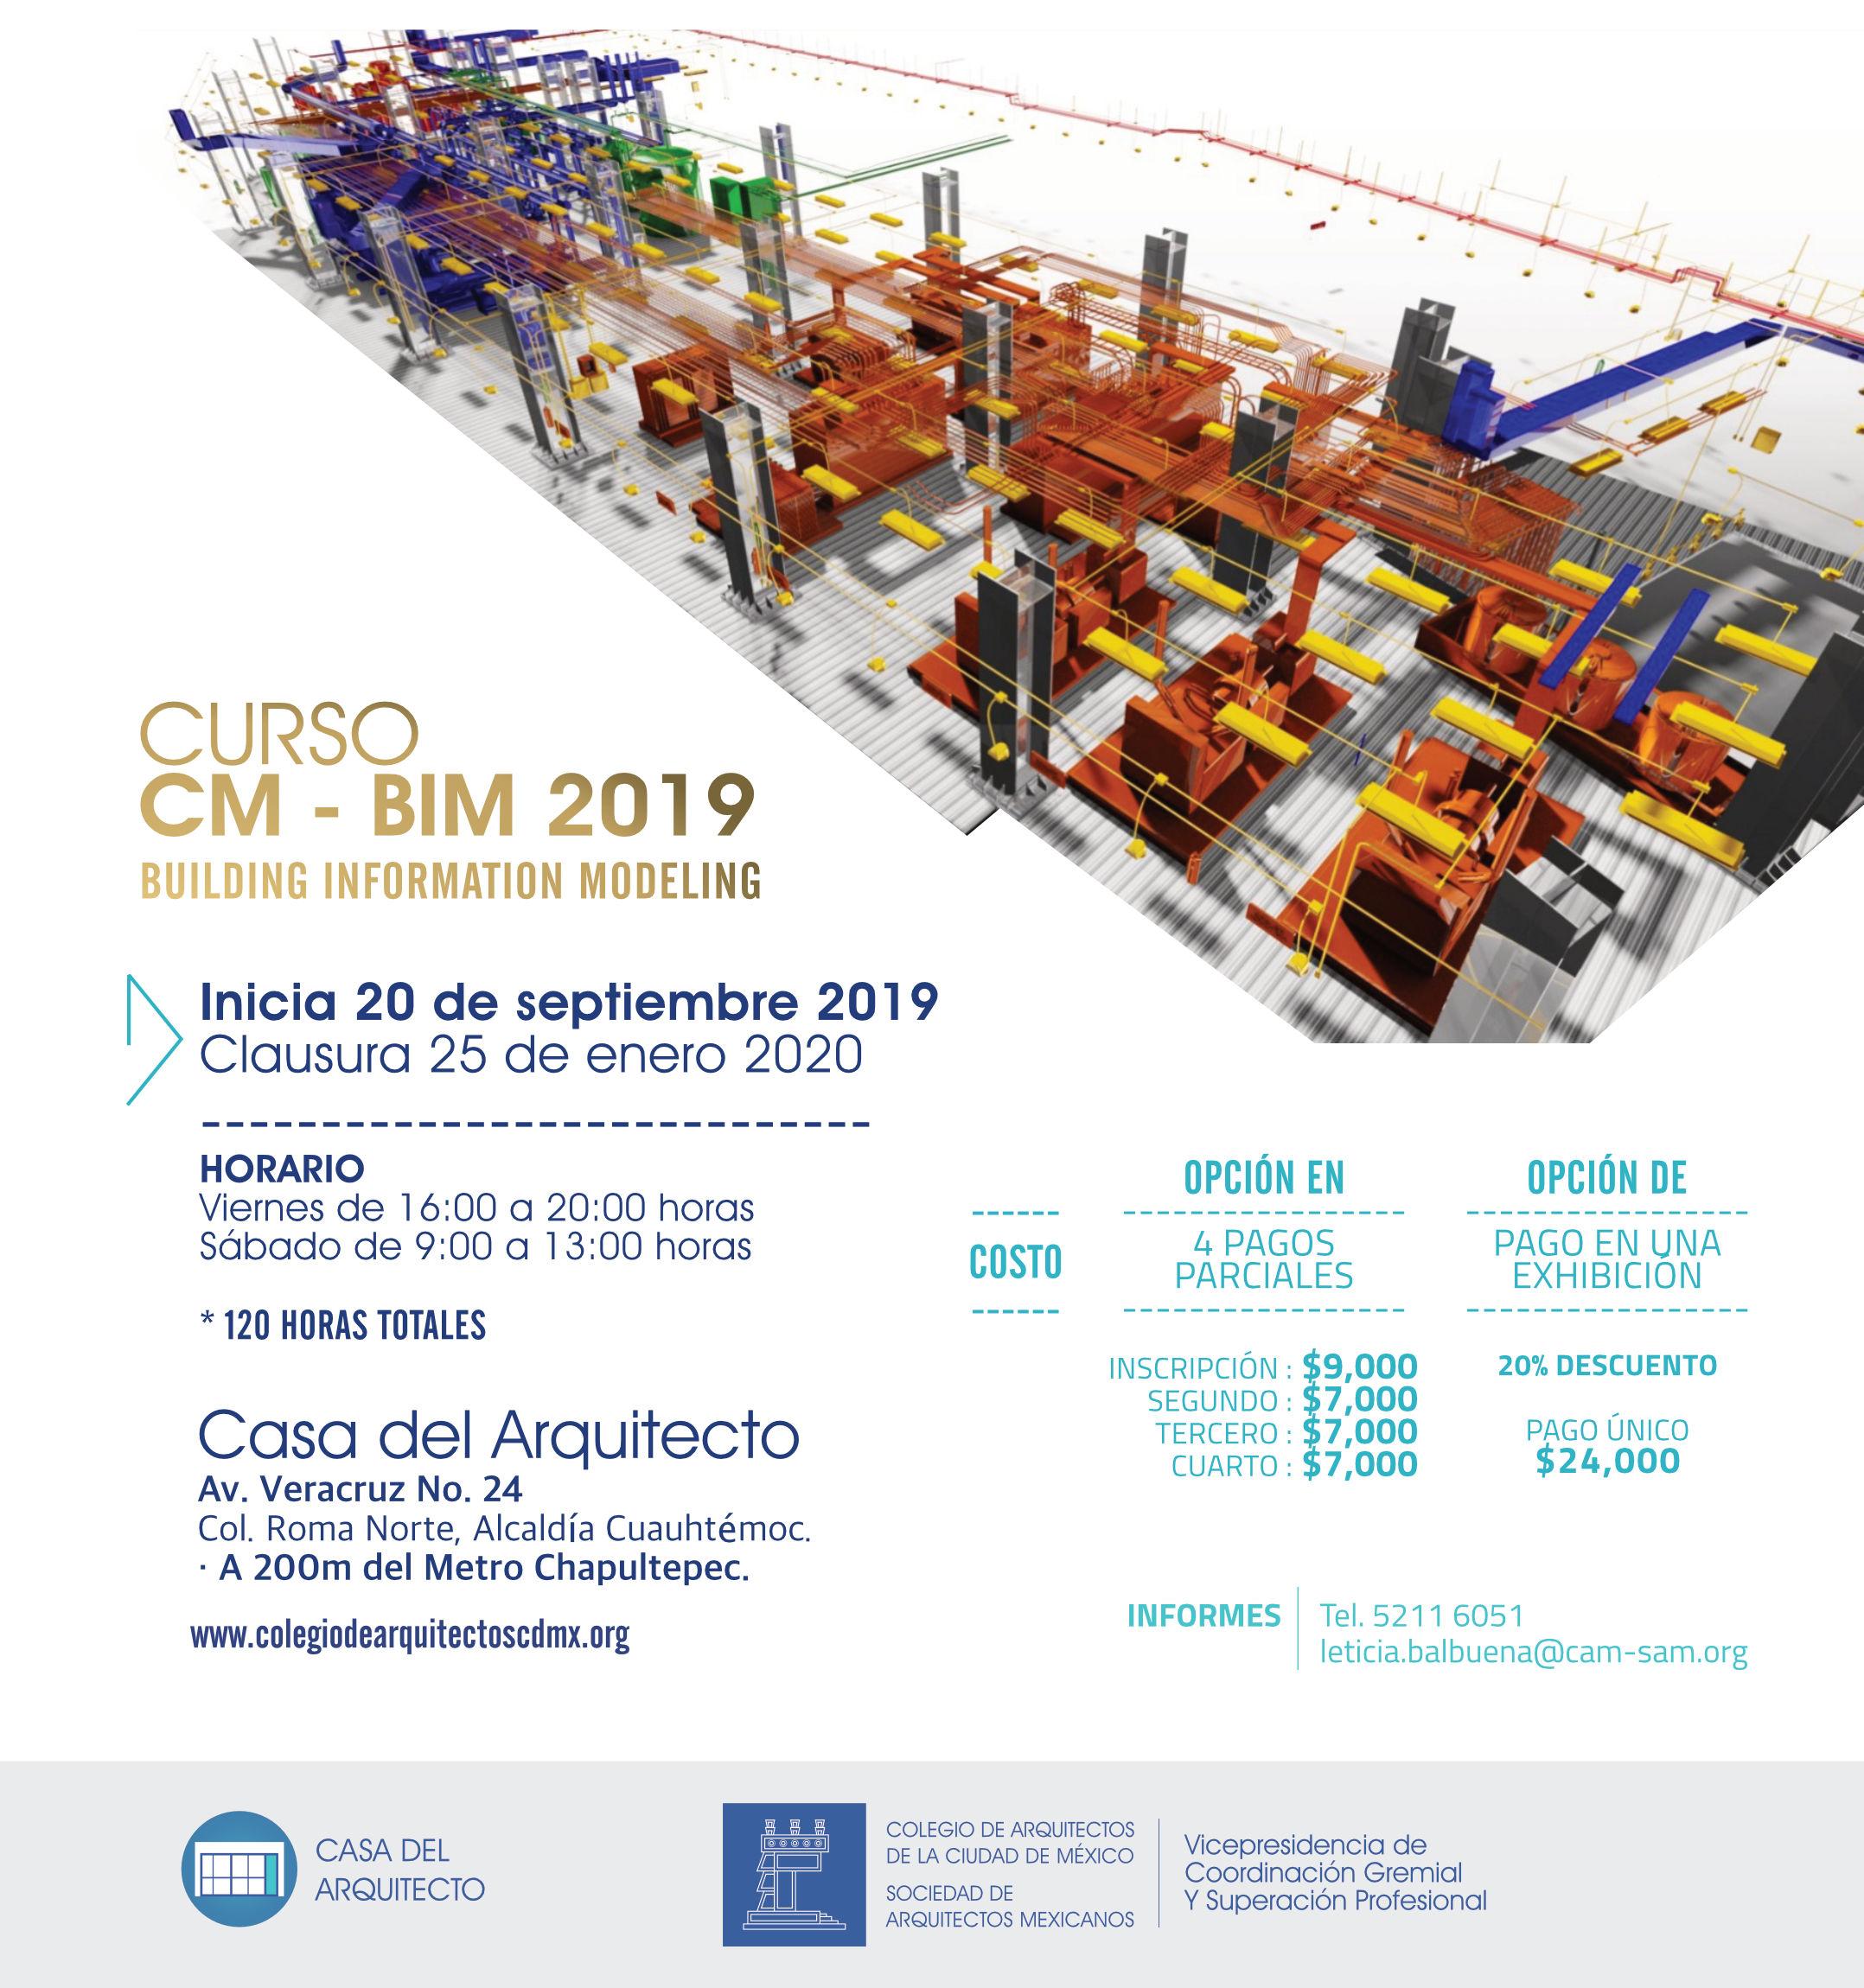 Curso CM - BIM 2019